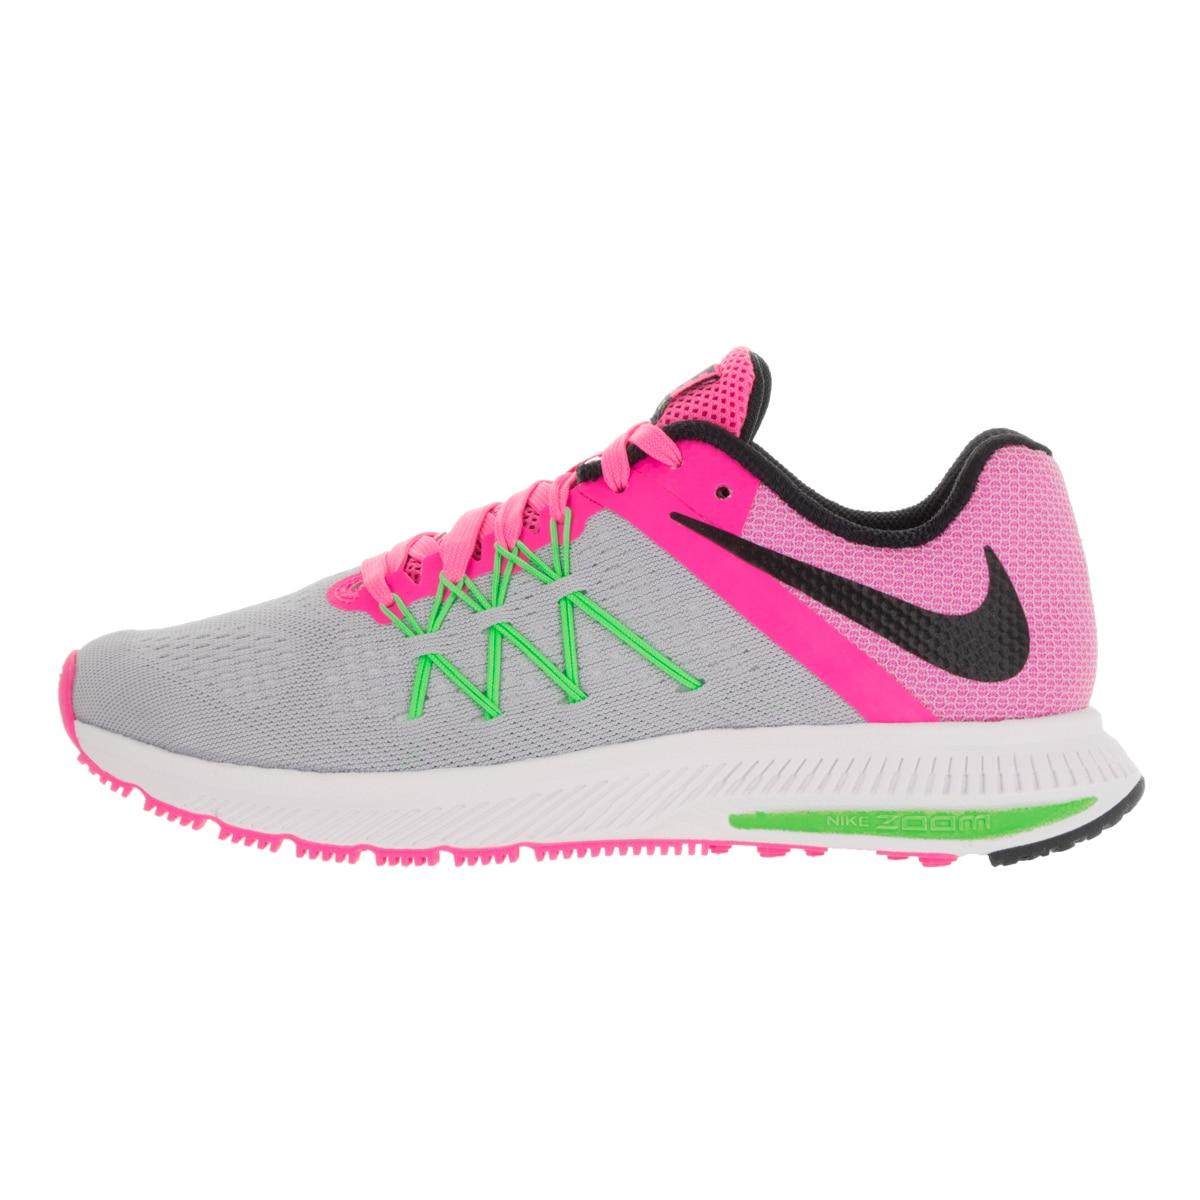 4750e93819b9 Shop Nike Women s Zoom Winflo 3 Wolf Grey Blk Pink Blast Electric Green  Running Shoe - Free Shipping Today - Overstock.com - 13344109